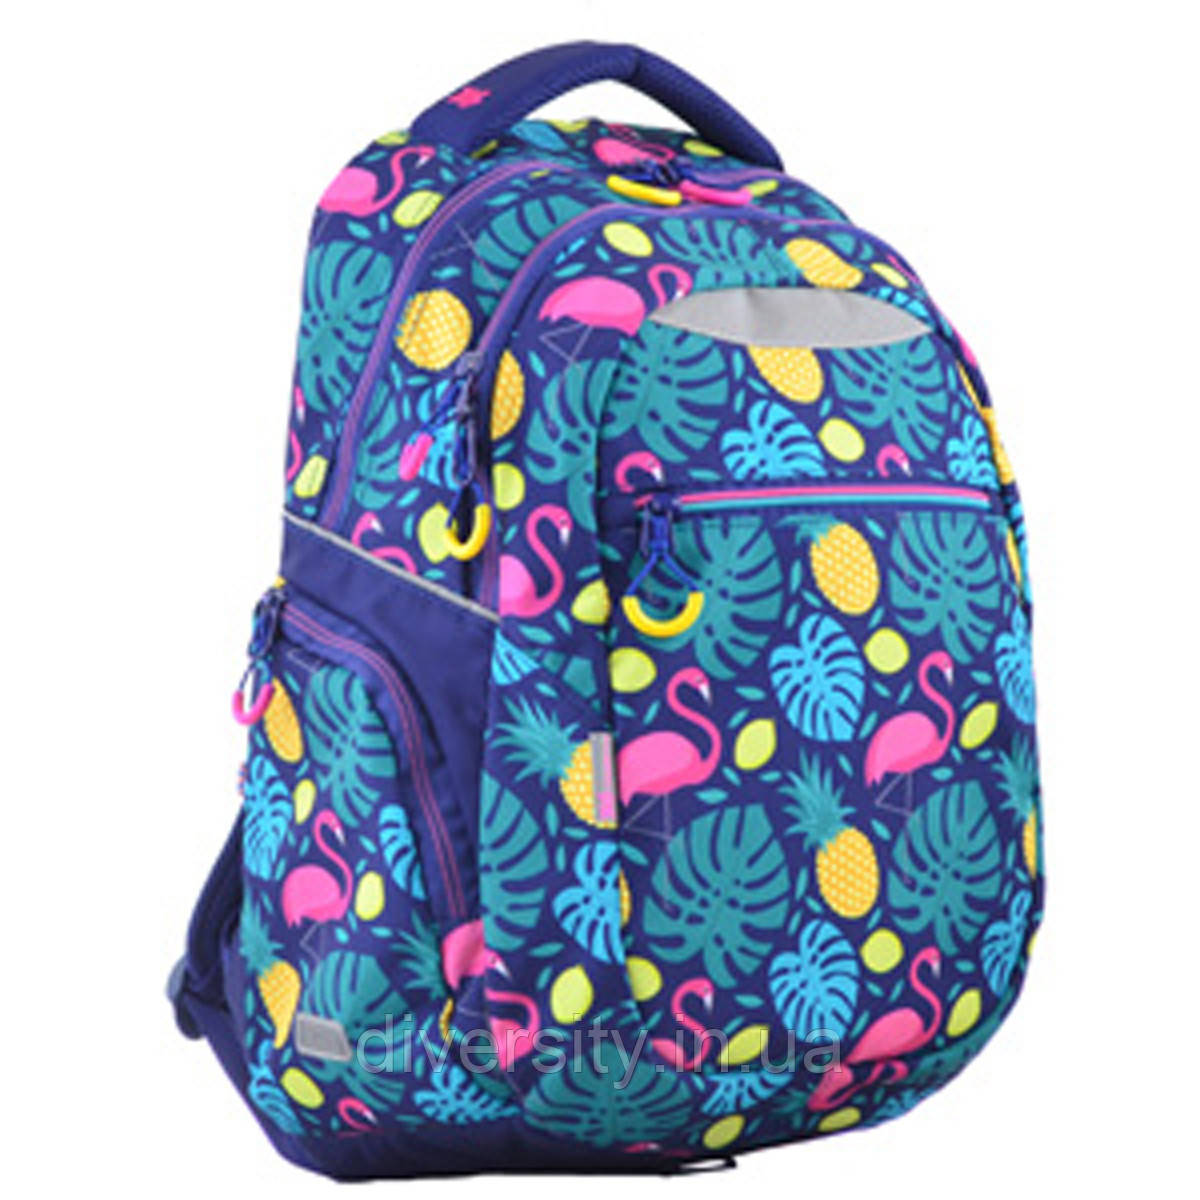 Молодежный рюкзак YES  T-23 Flamingo, 45*31*14.5